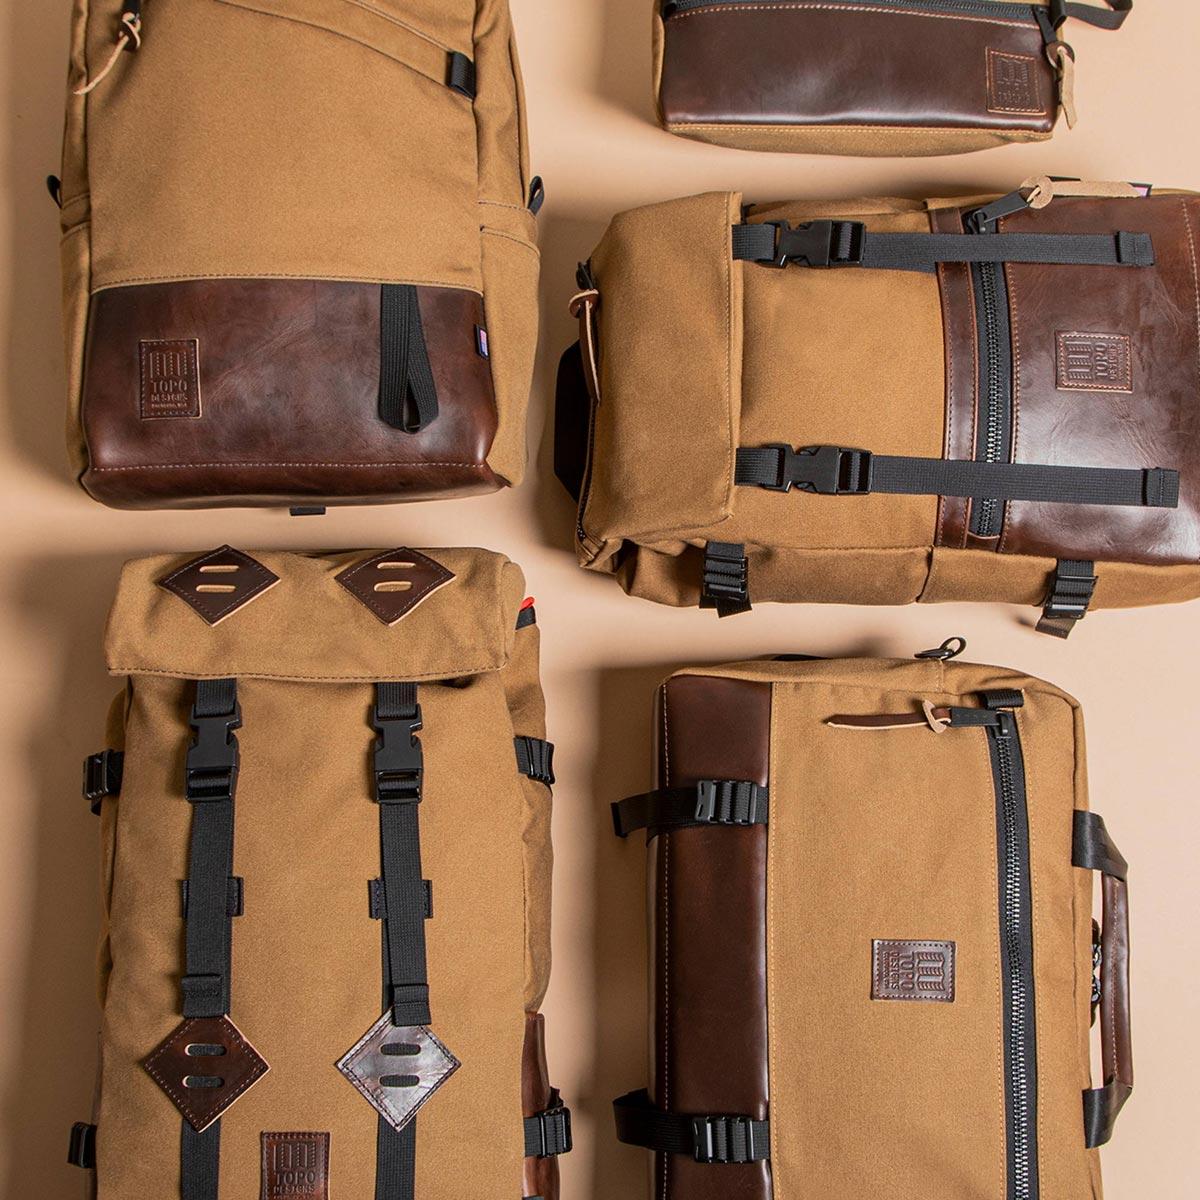 Topo Designs Klettersack Heritage Dark Khaki Canvas/Dark Brown Leather, ideale rugzak voor reizen, citytrip, wandelen of andere outdoor activiteiten